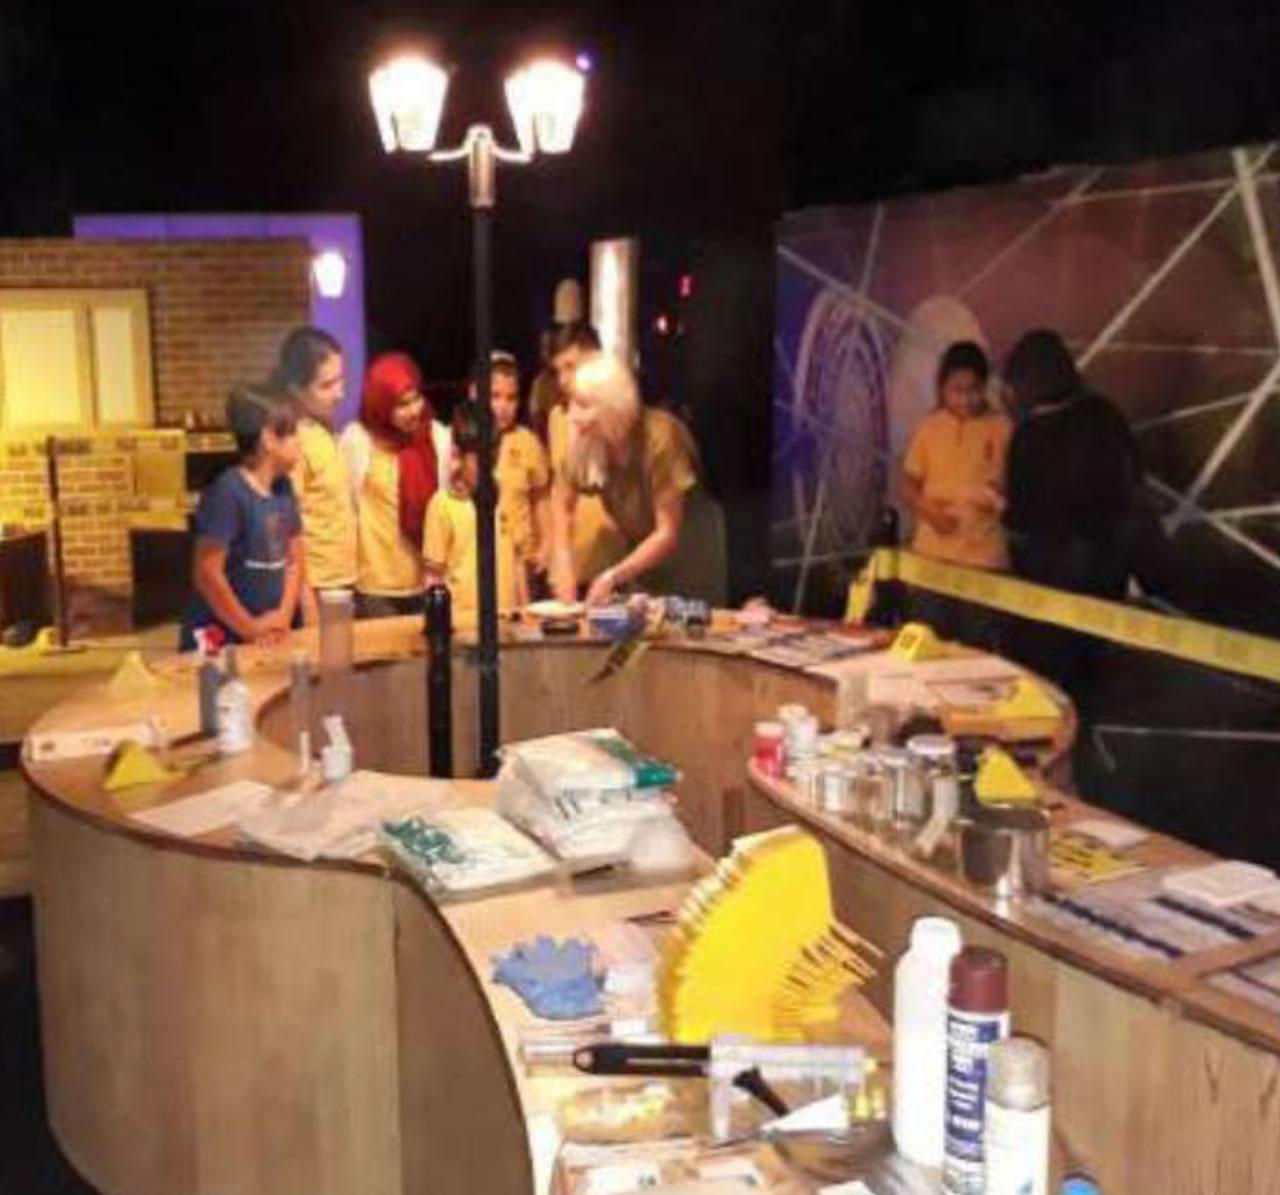 CSI Olay Yeri İnceleme Konsepti - Kriminal İnceleme Arena